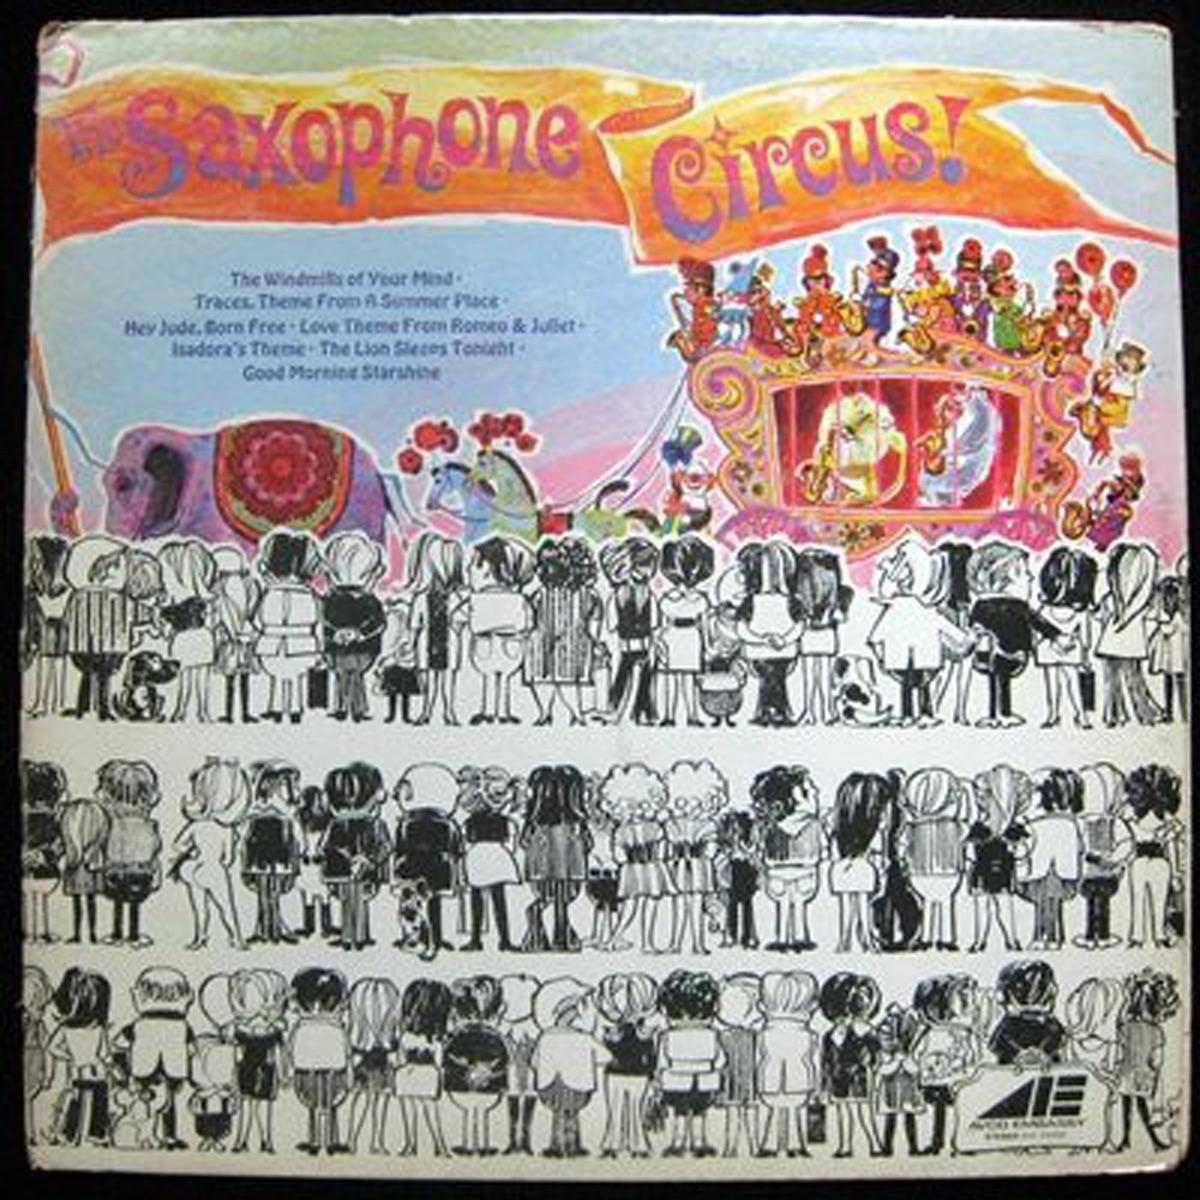 The Saxophone Circus